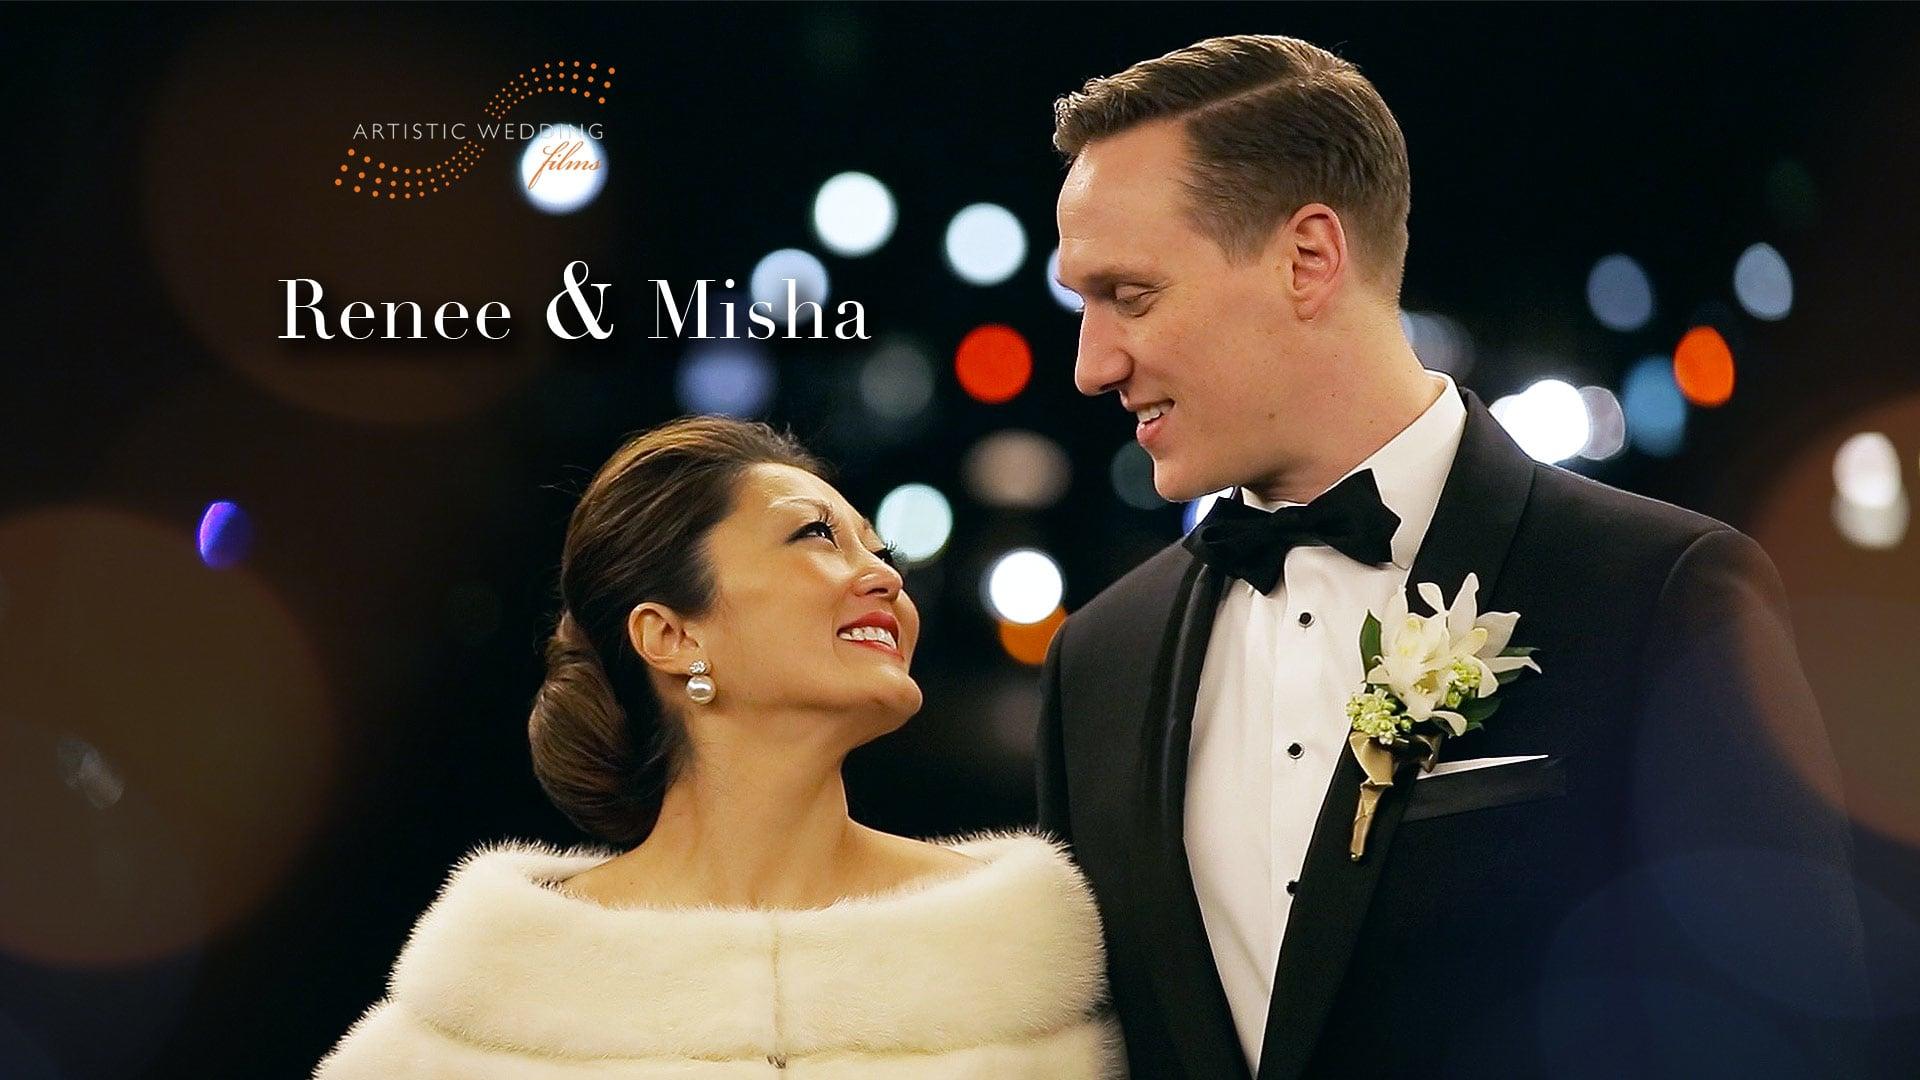 Fairmont Copley Plaza // Renee & Michael's Wedding Highlights Film // Stunning Boston Wedding